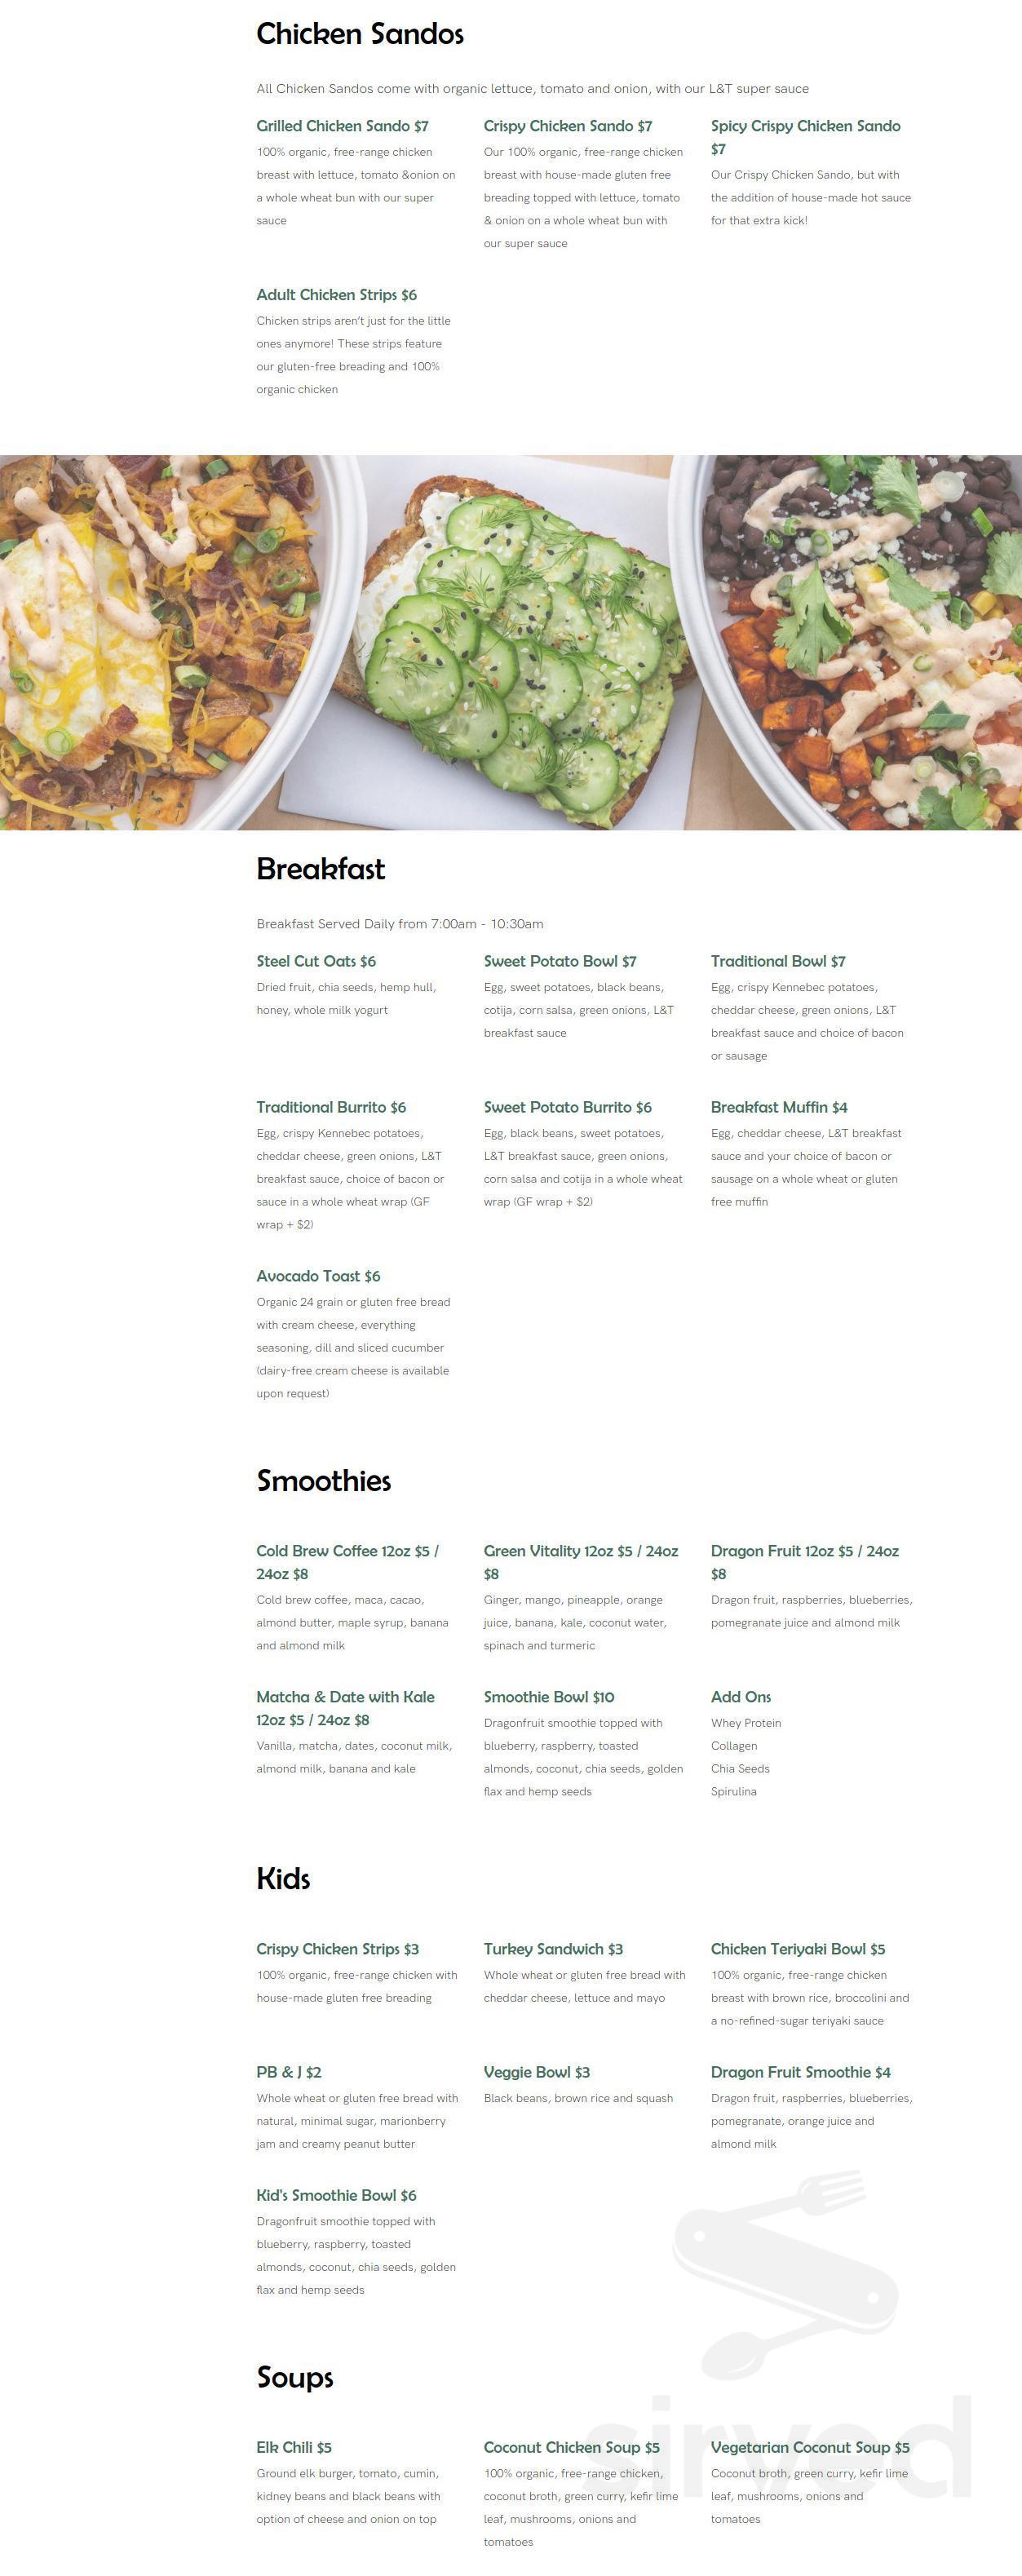 Menu for Life & Time: Free Range Fast Food in Bend, Oregon